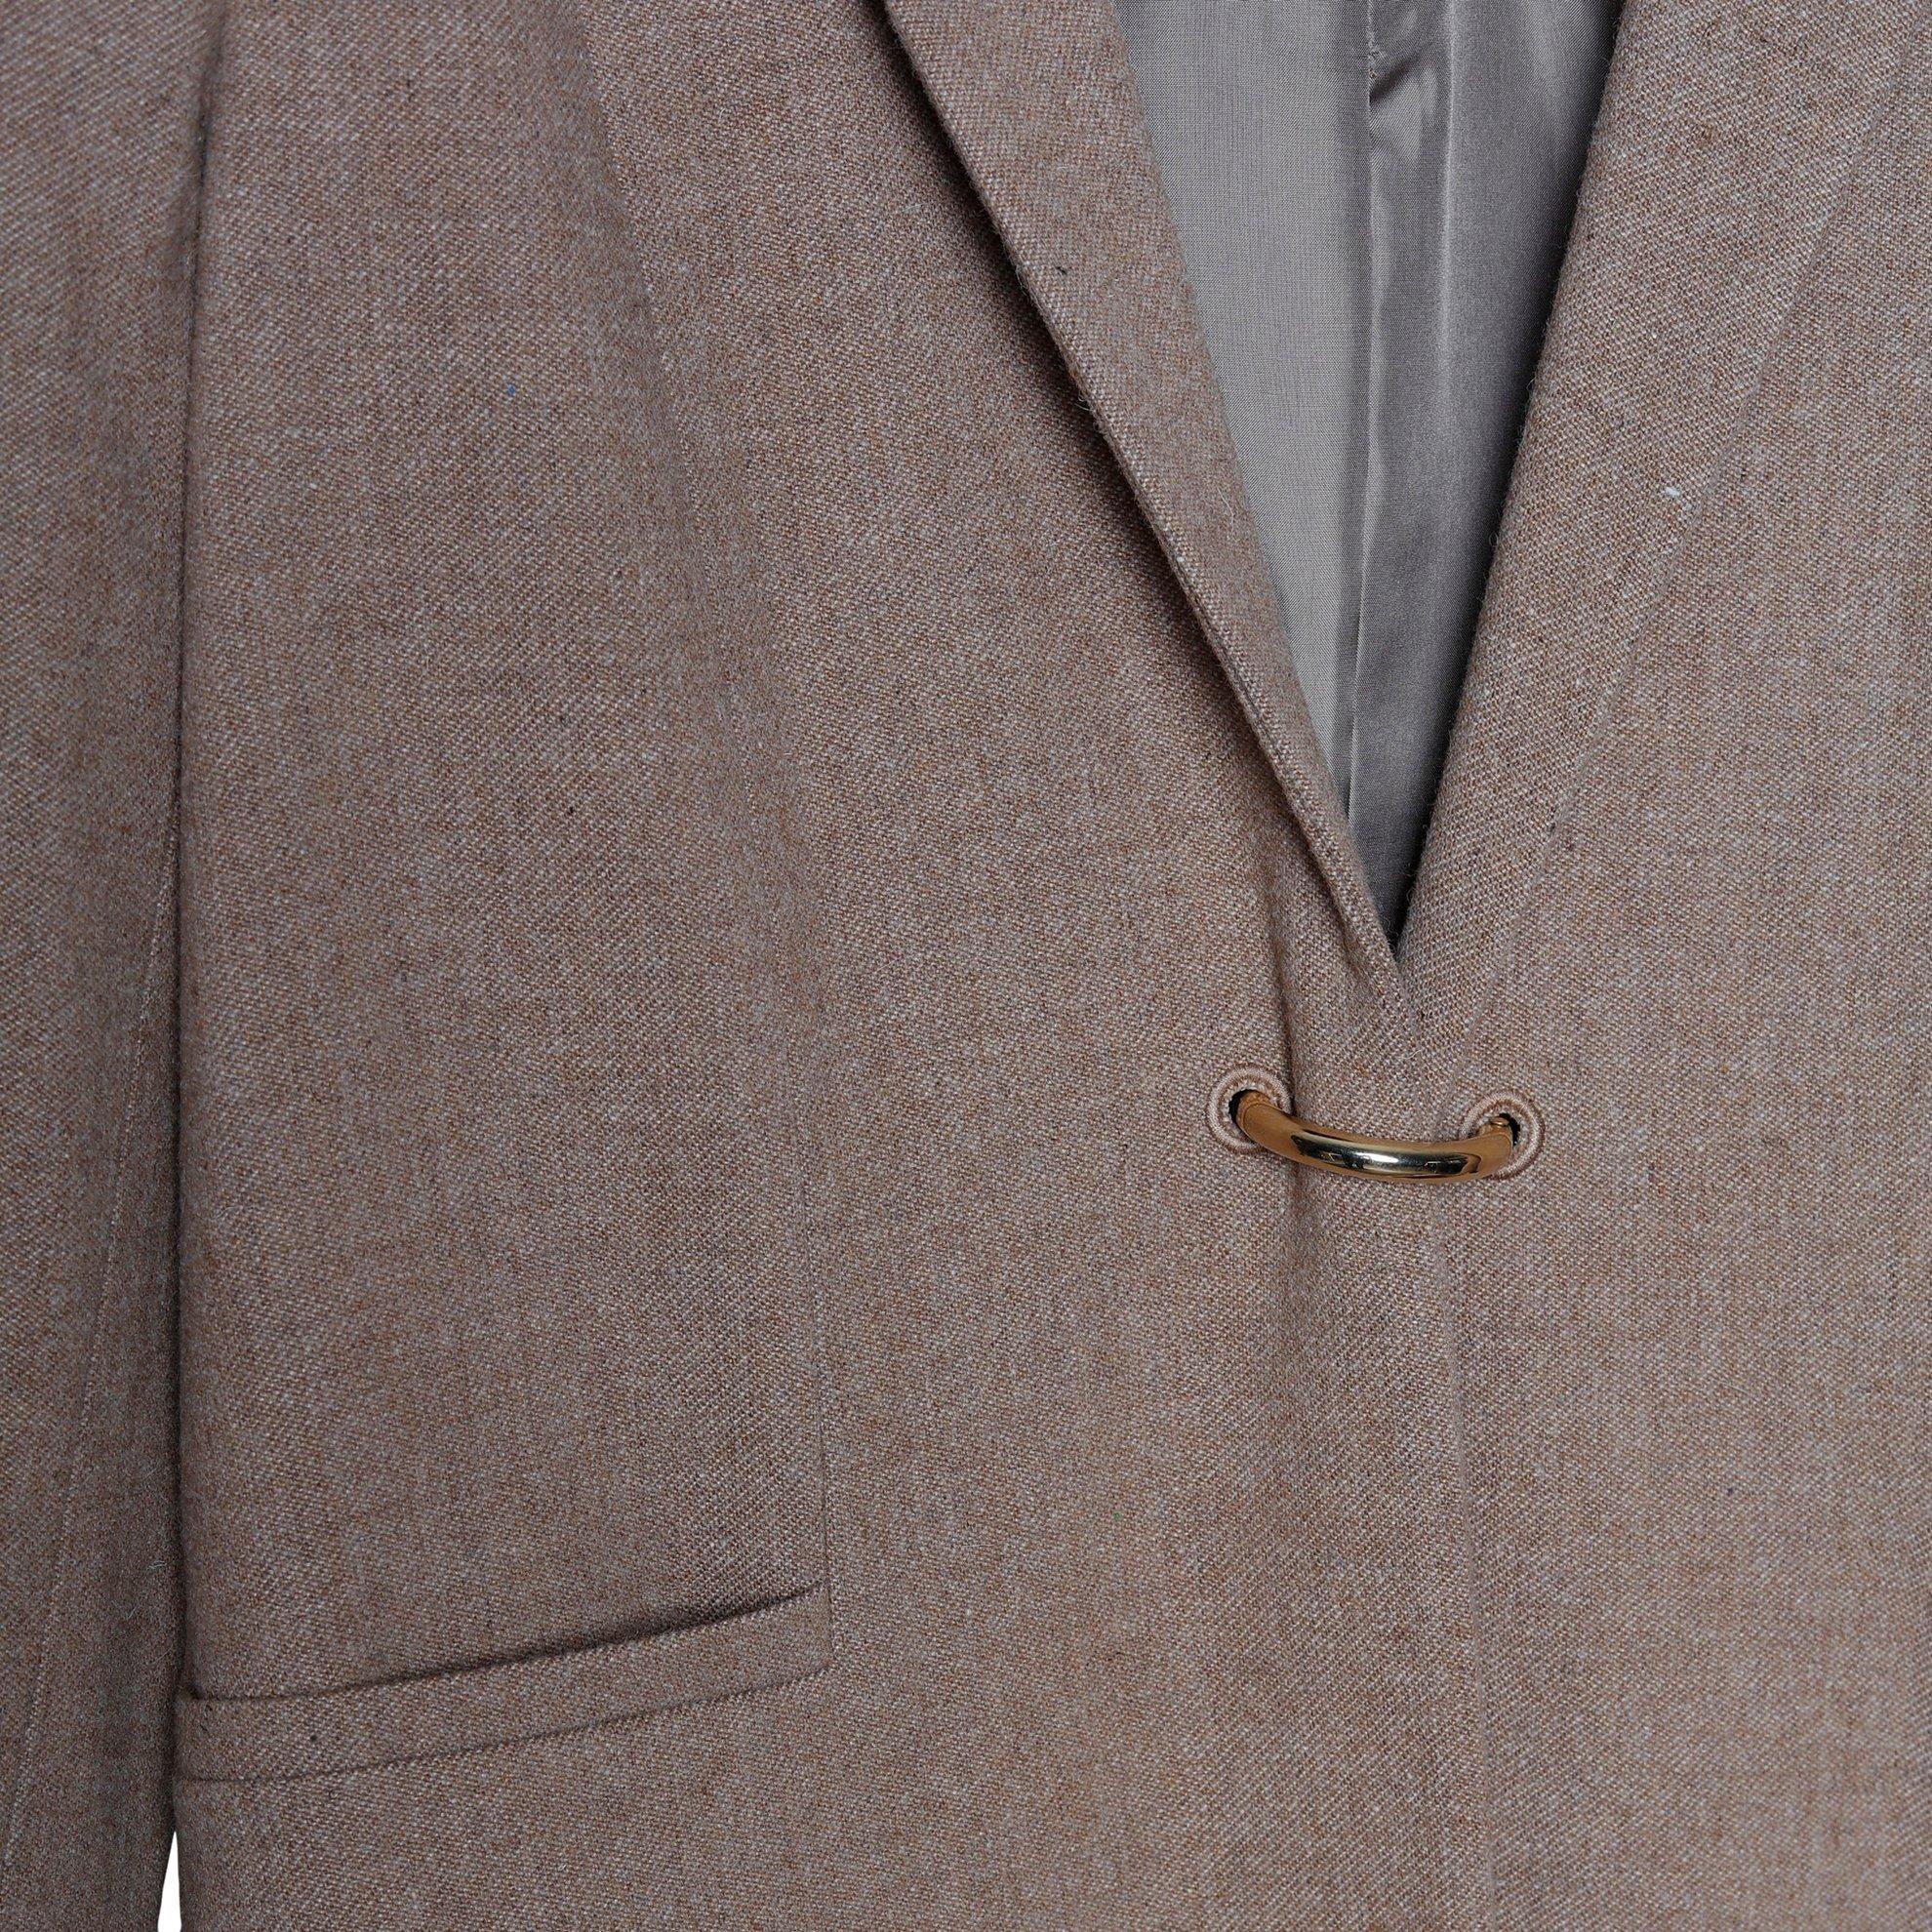 resm Toka Detaylı Palto